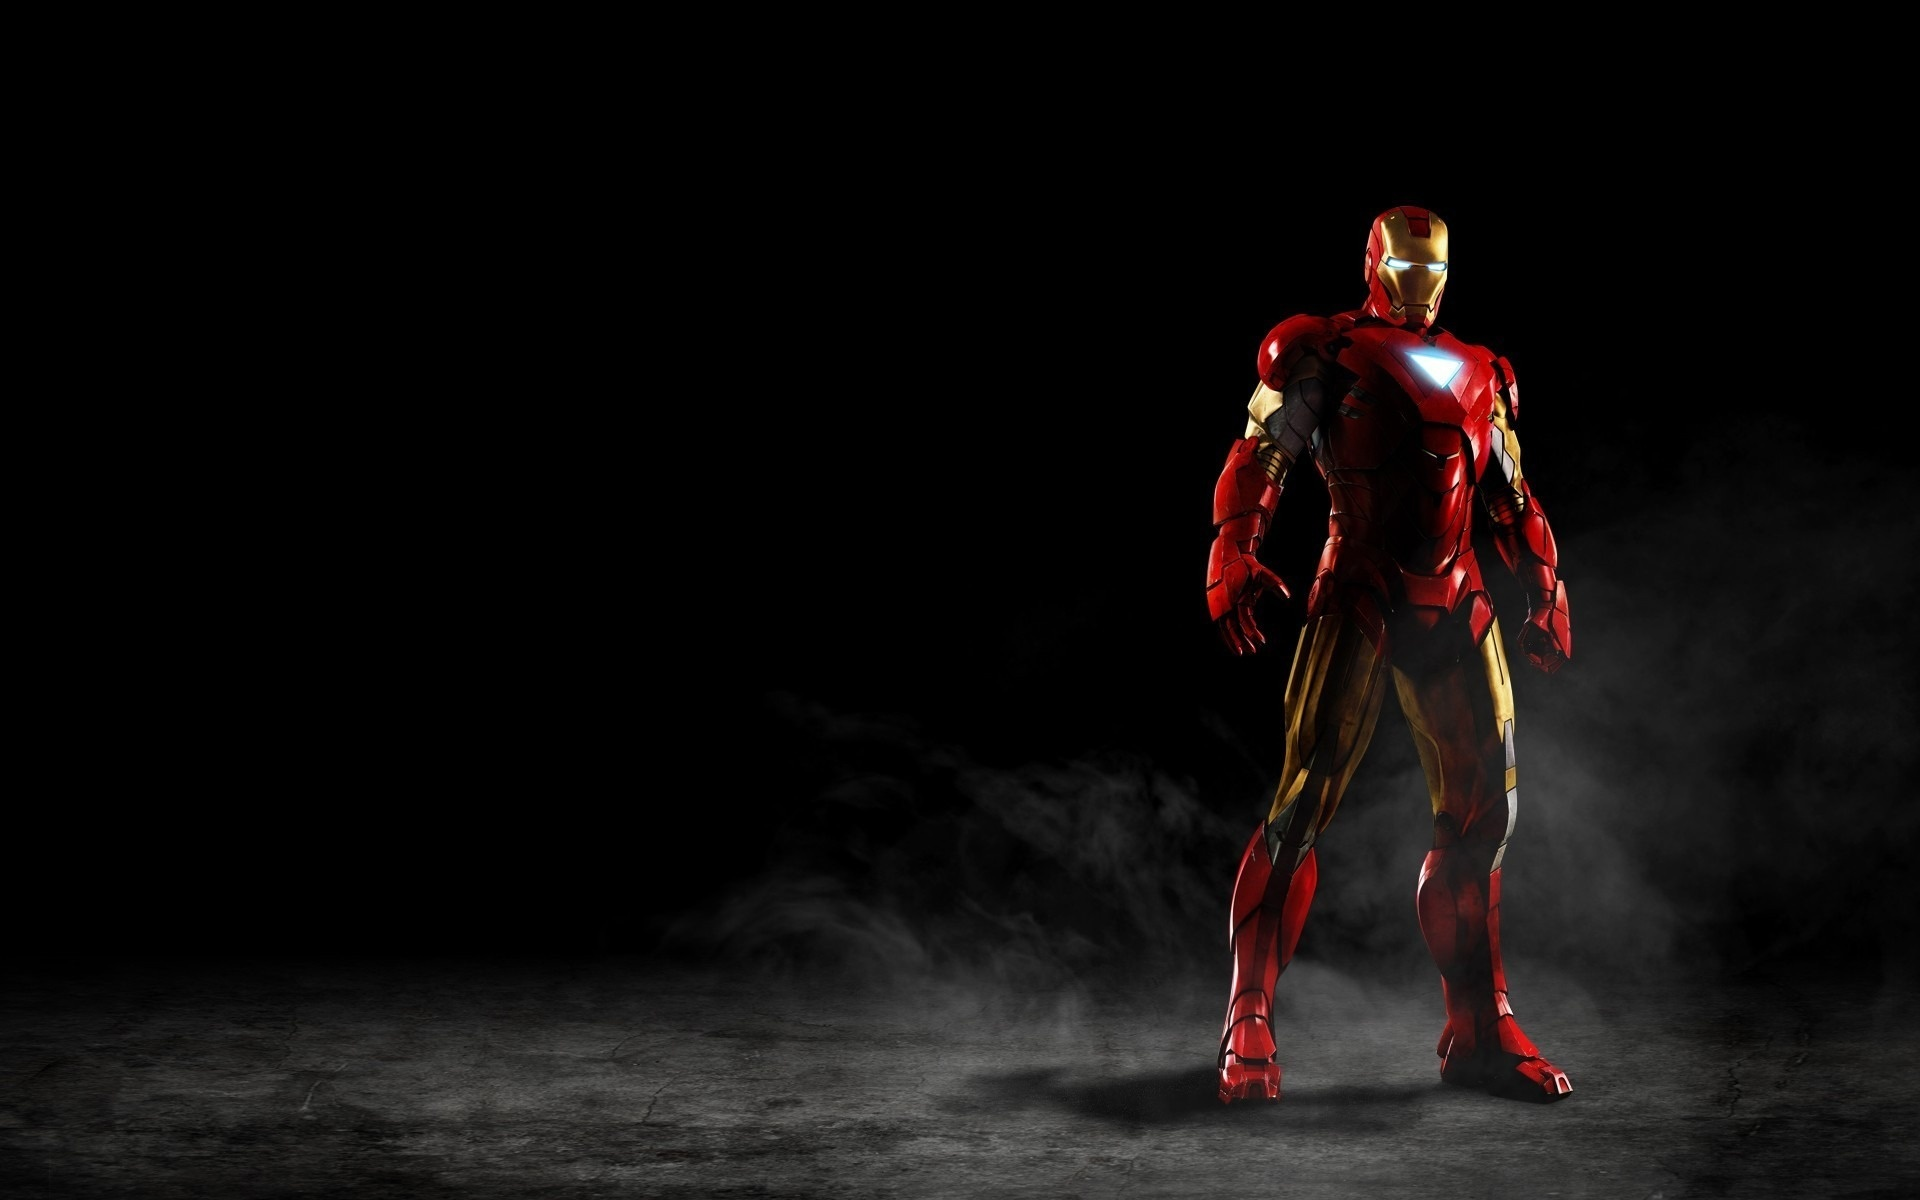 Iron Man Wallpaper HD 1080p cyborg photo Celebrity and Movie 1920x1200